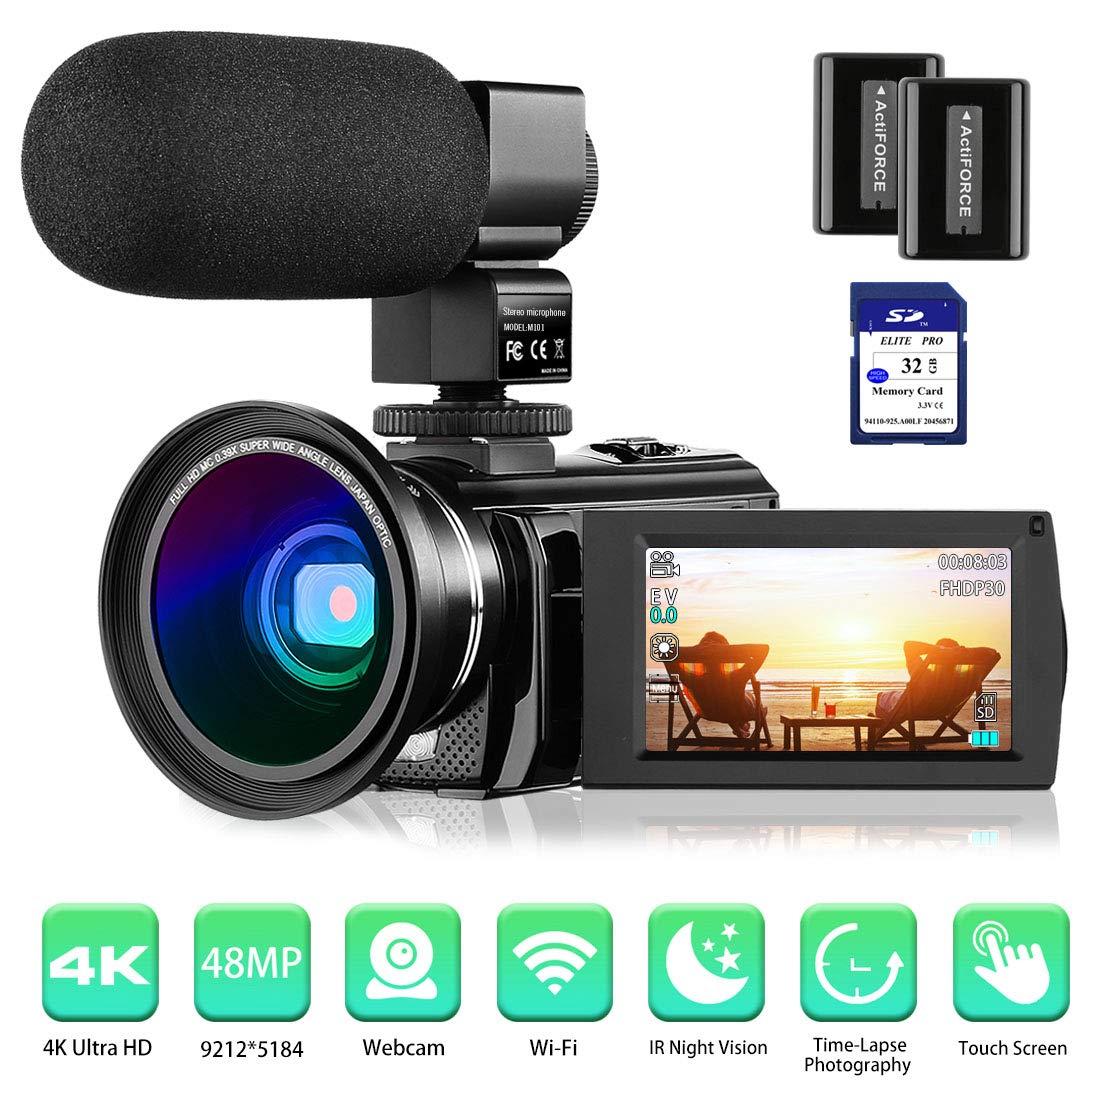 Camcorder Rosdeca External Microphone Batteries